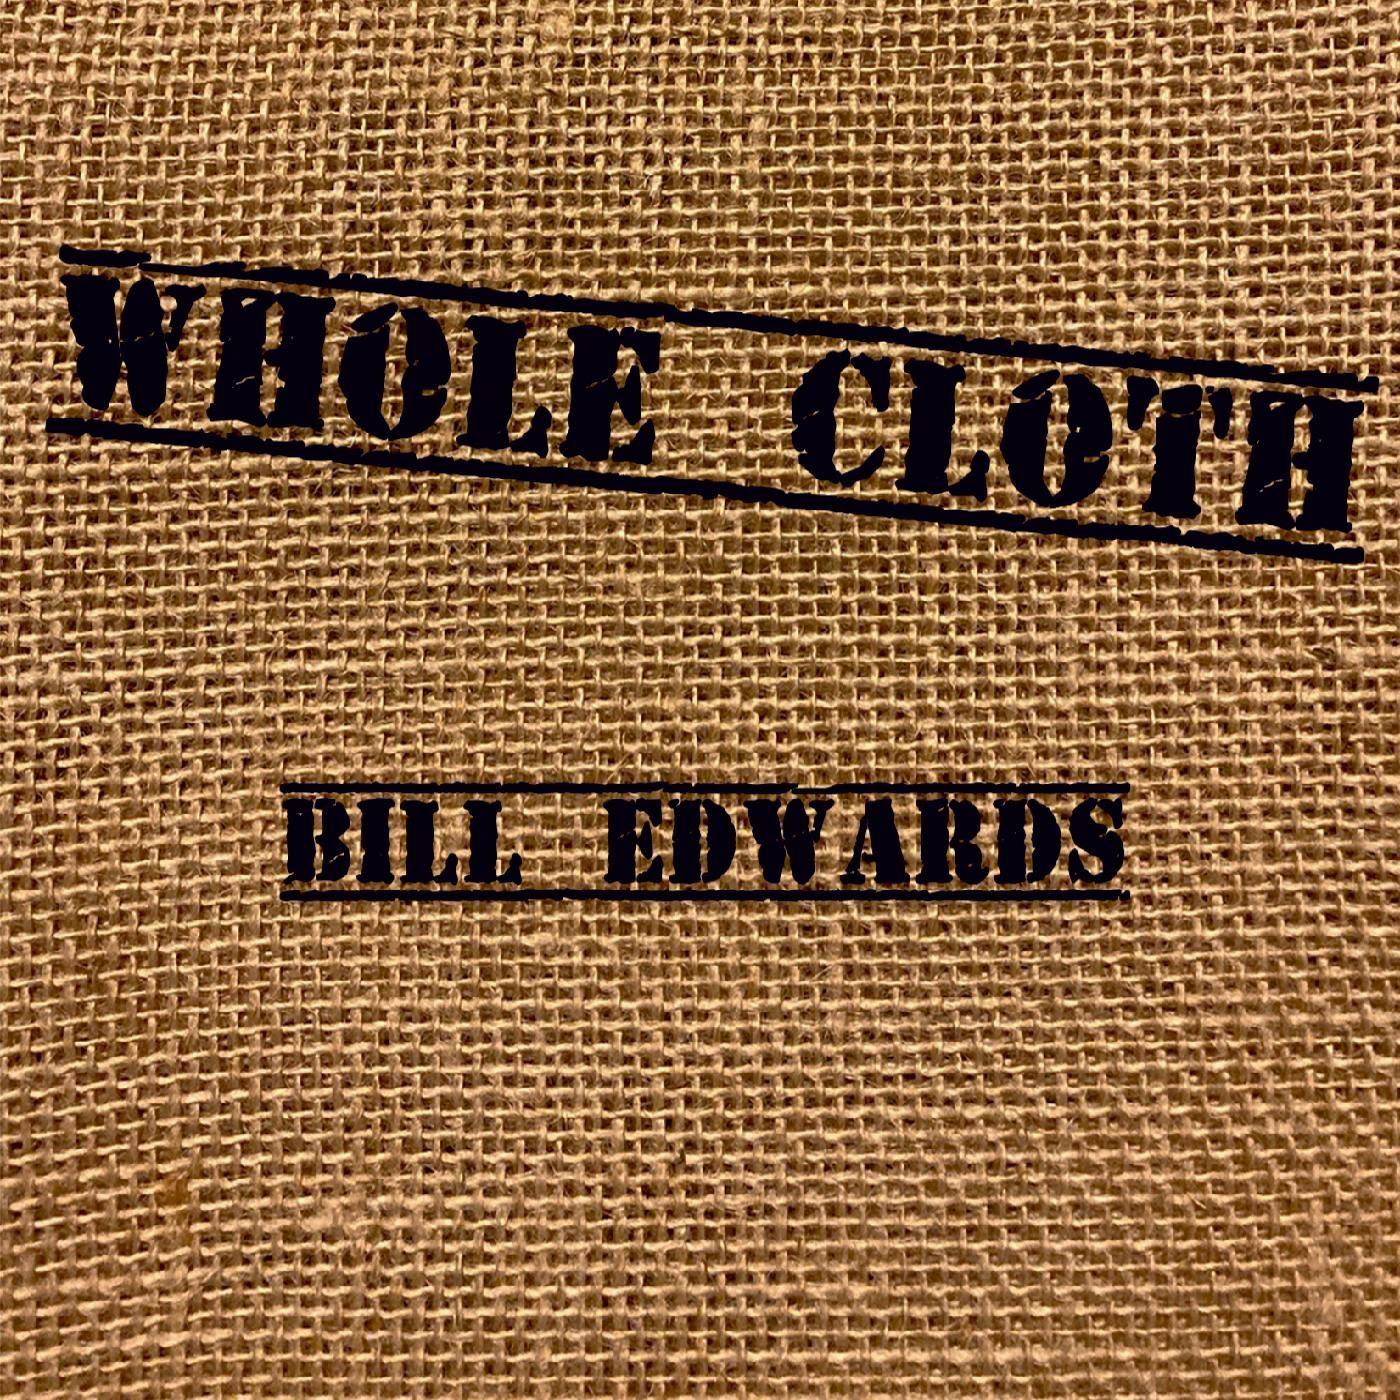 Whole Cloth album art